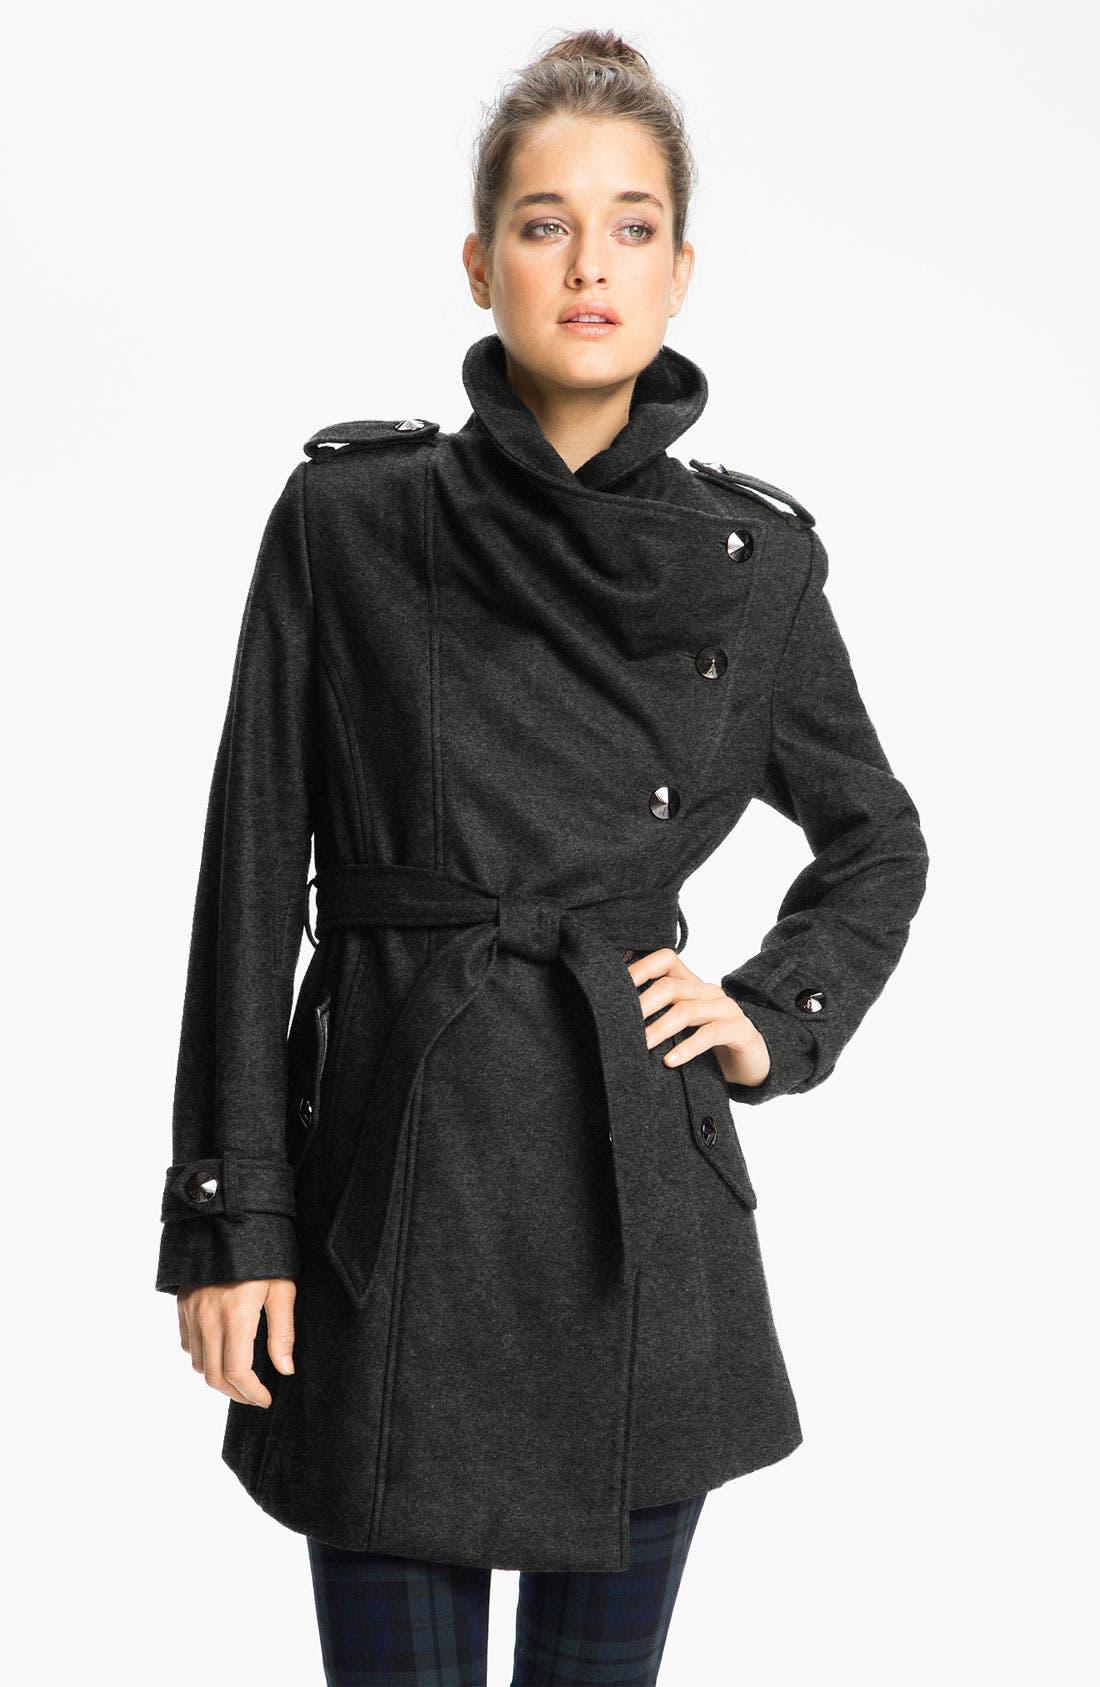 Alternate Image 1 Selected - Sam Edelman Asymmetrical Belted Coat (Online Exclusive)